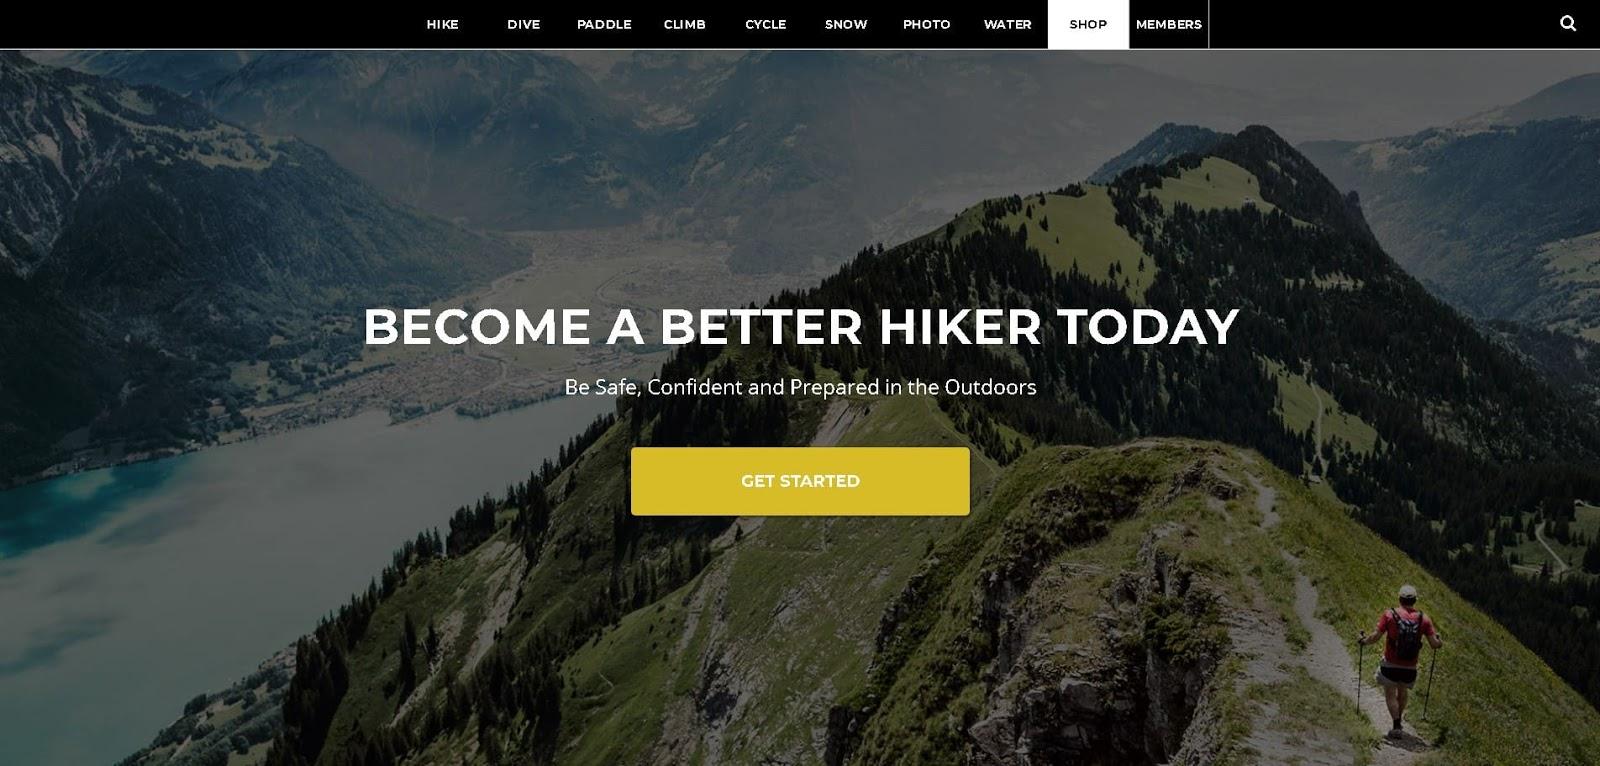 primer-nishi-dlya-bloga-the-adventure-junkies-niche-outdoor-adventure